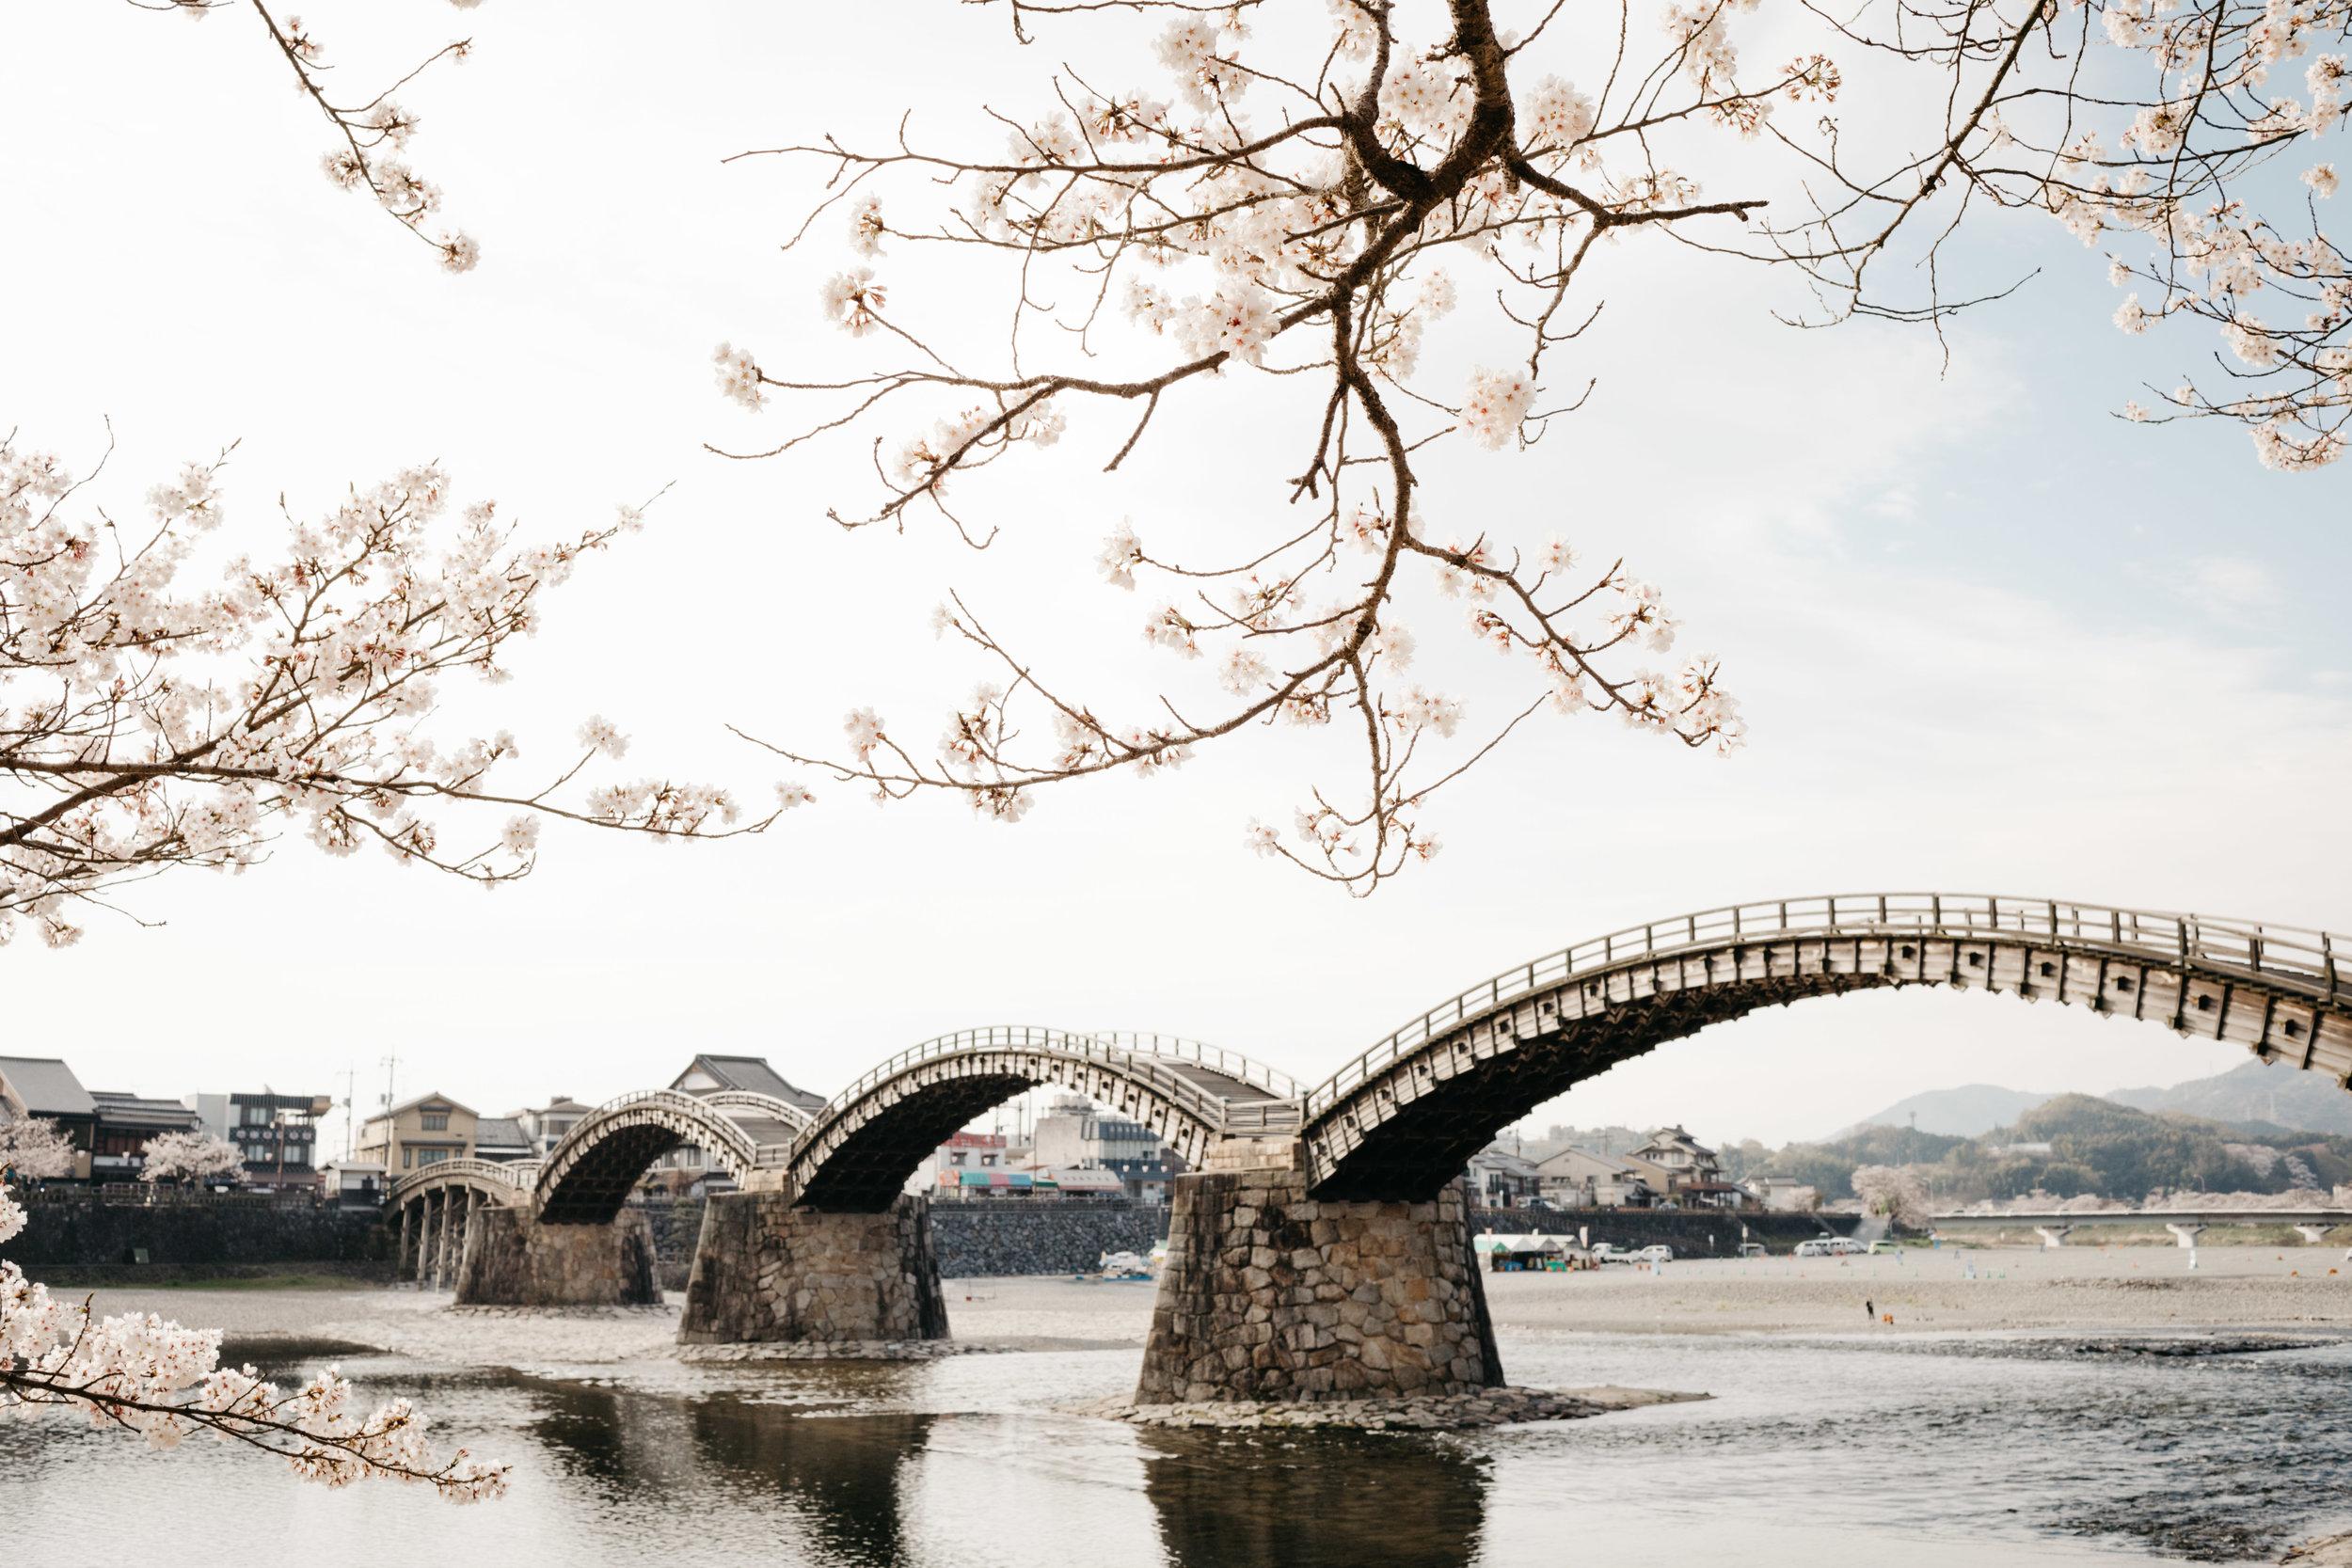 iwkauni-kintai-bridge-cherry-blossoms-photo-by-samantha-look.jpg